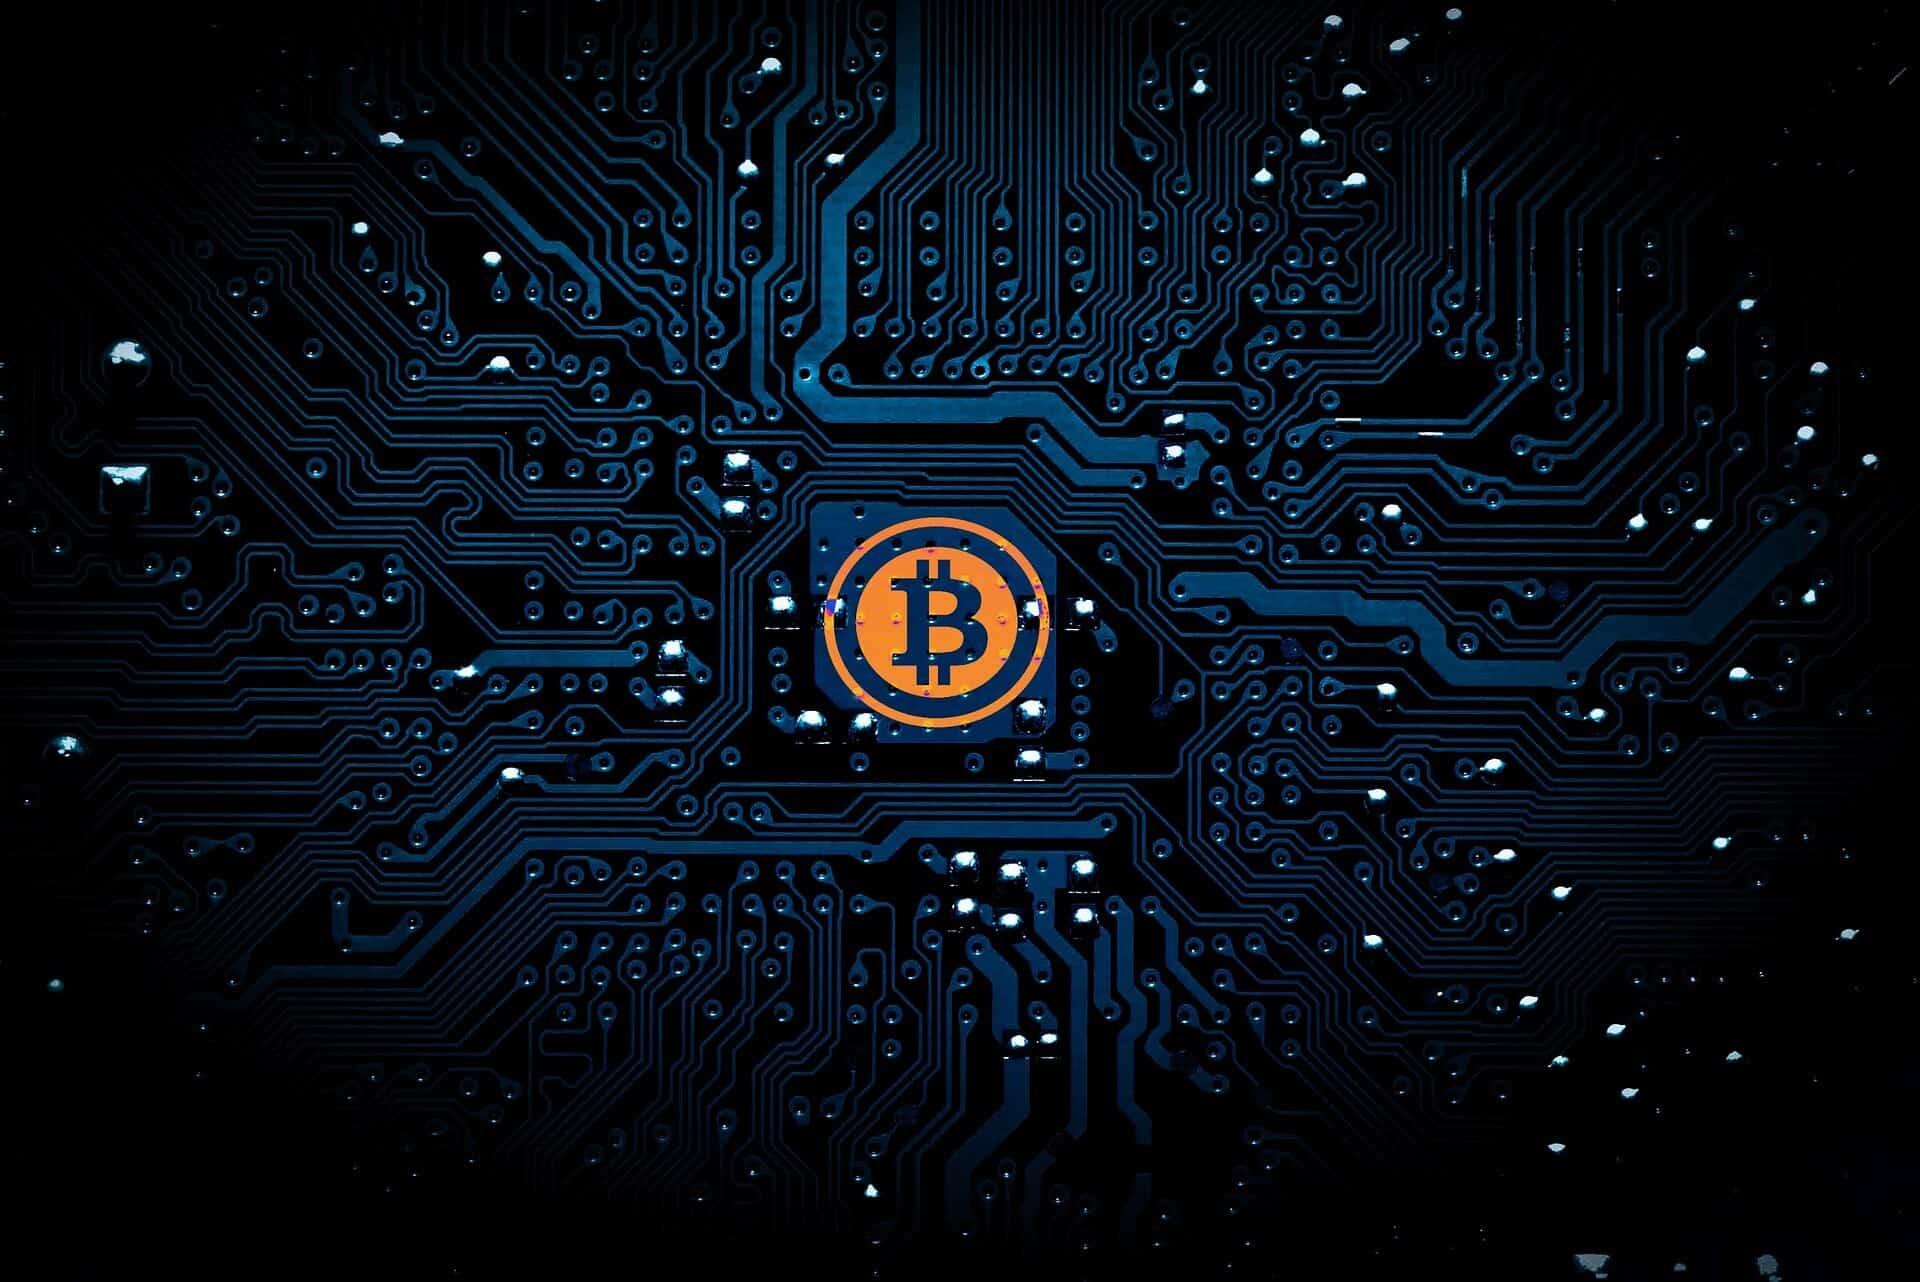 Novogratz Expects Bitcoin to Trade in Range of $7,000 To $10,000